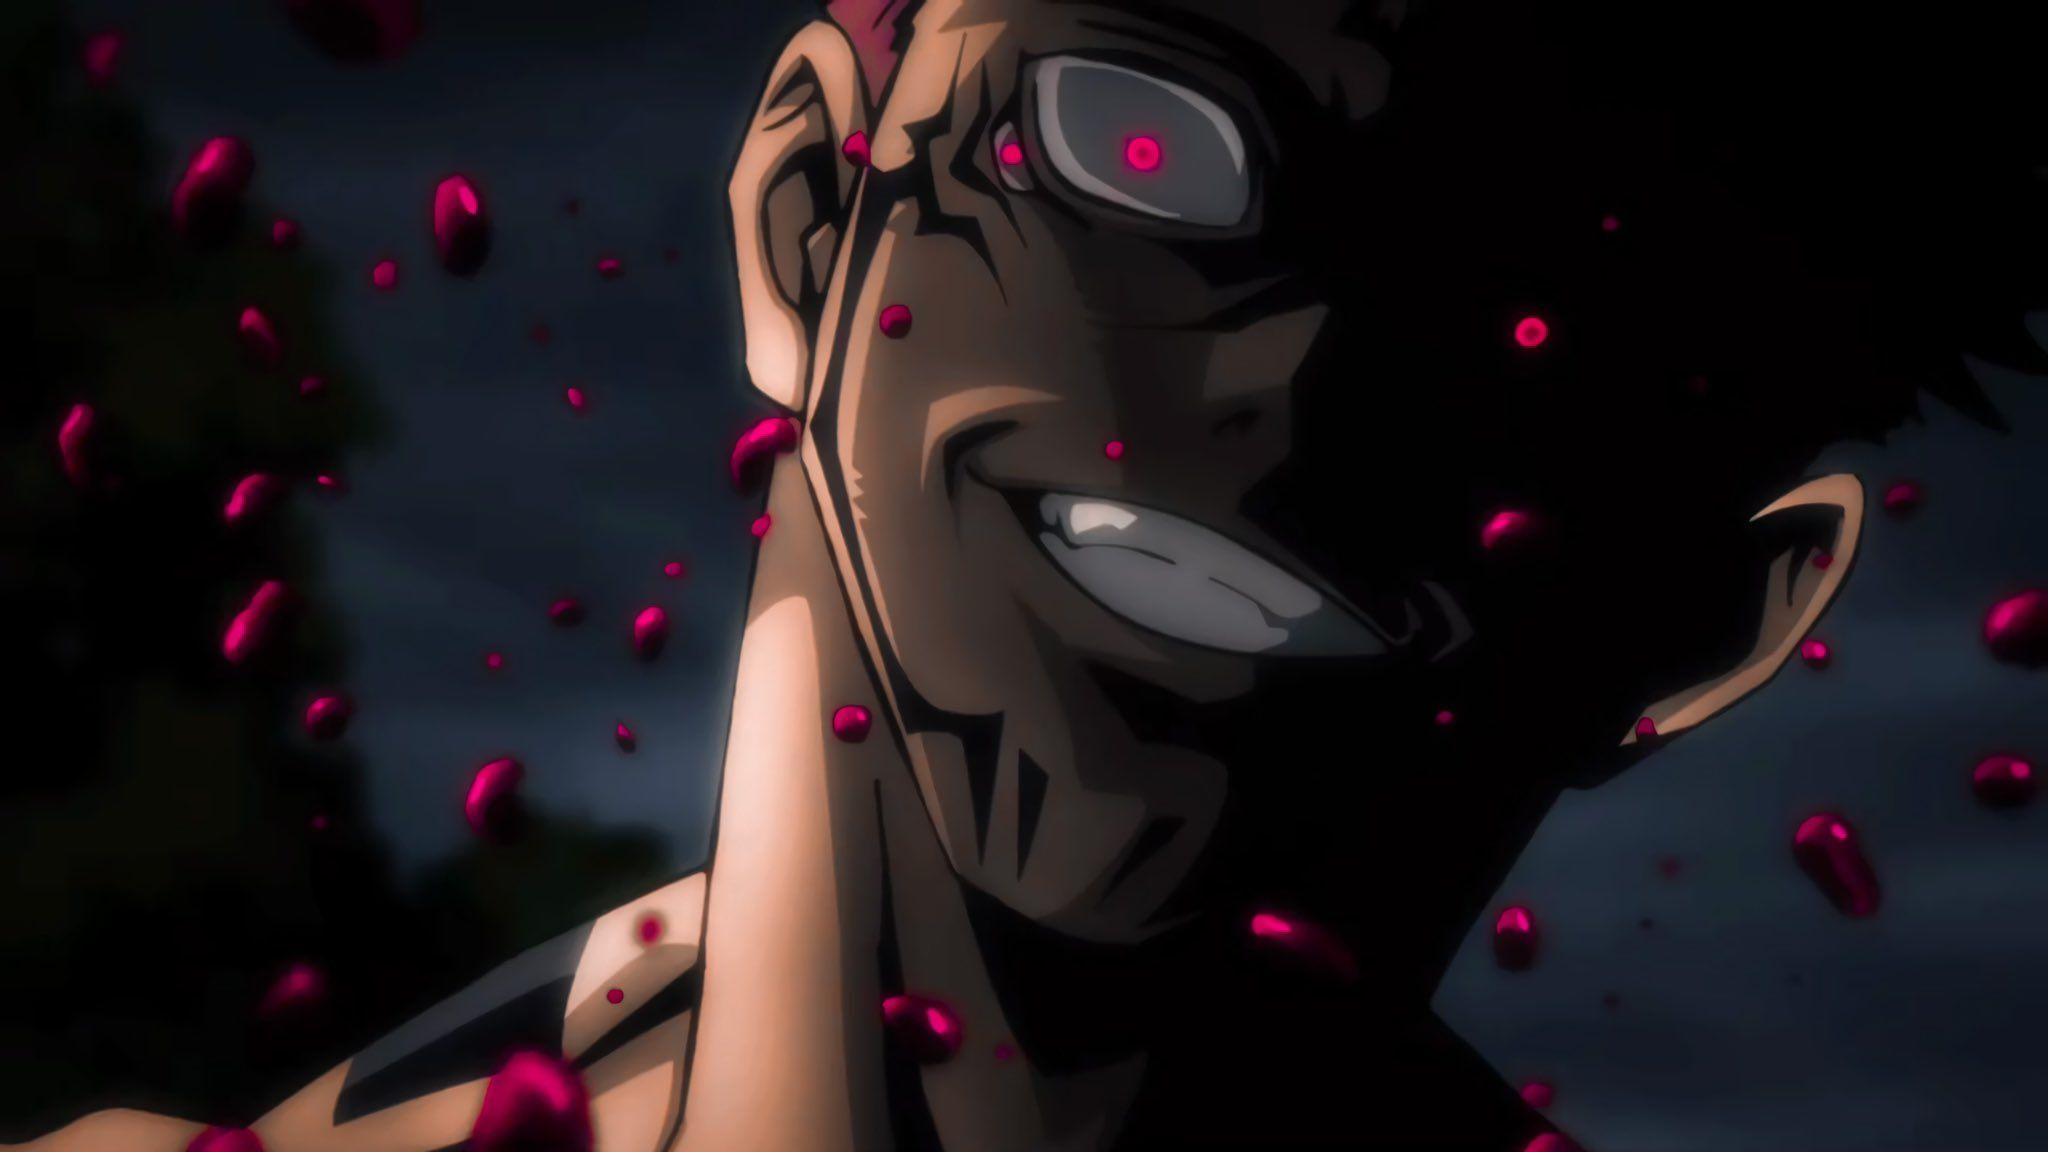 Storm On Twitter In 2021 Anime Anime Wallpaper Jujutsu 30 gif wallpaper anime